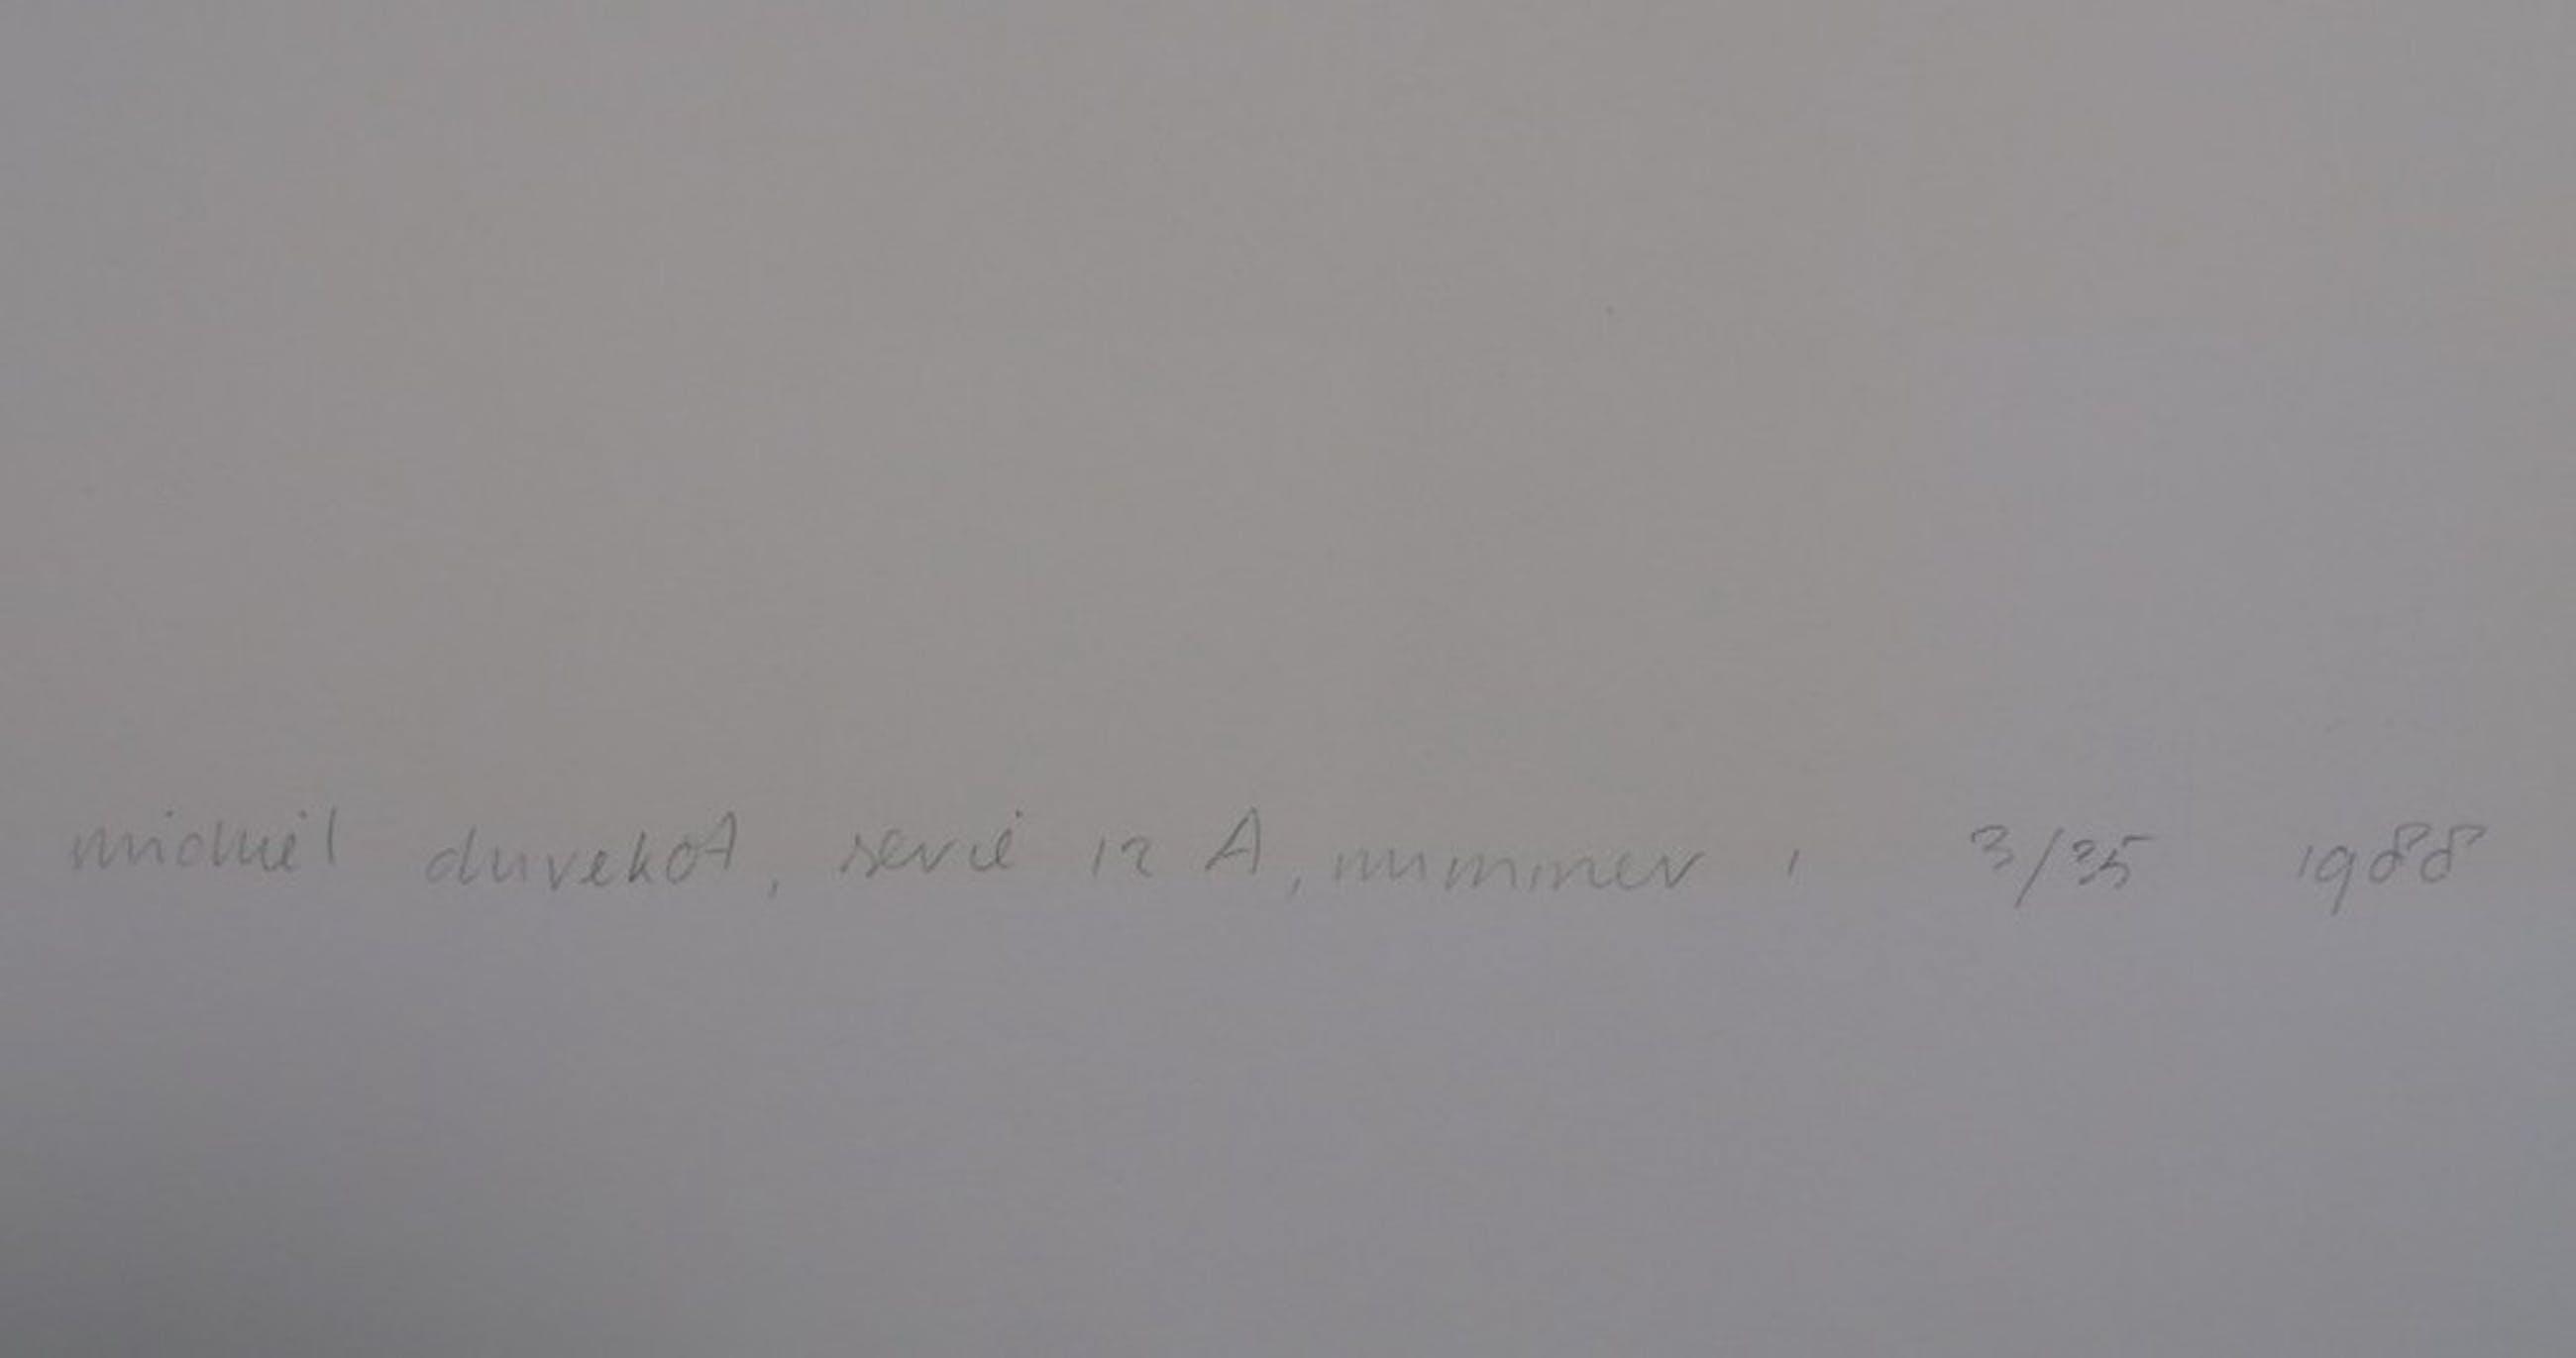 Michiel Duvekot: Linosnede, Geometrische compositie, Serie 12A nr. 1 kopen? Bied vanaf 1!